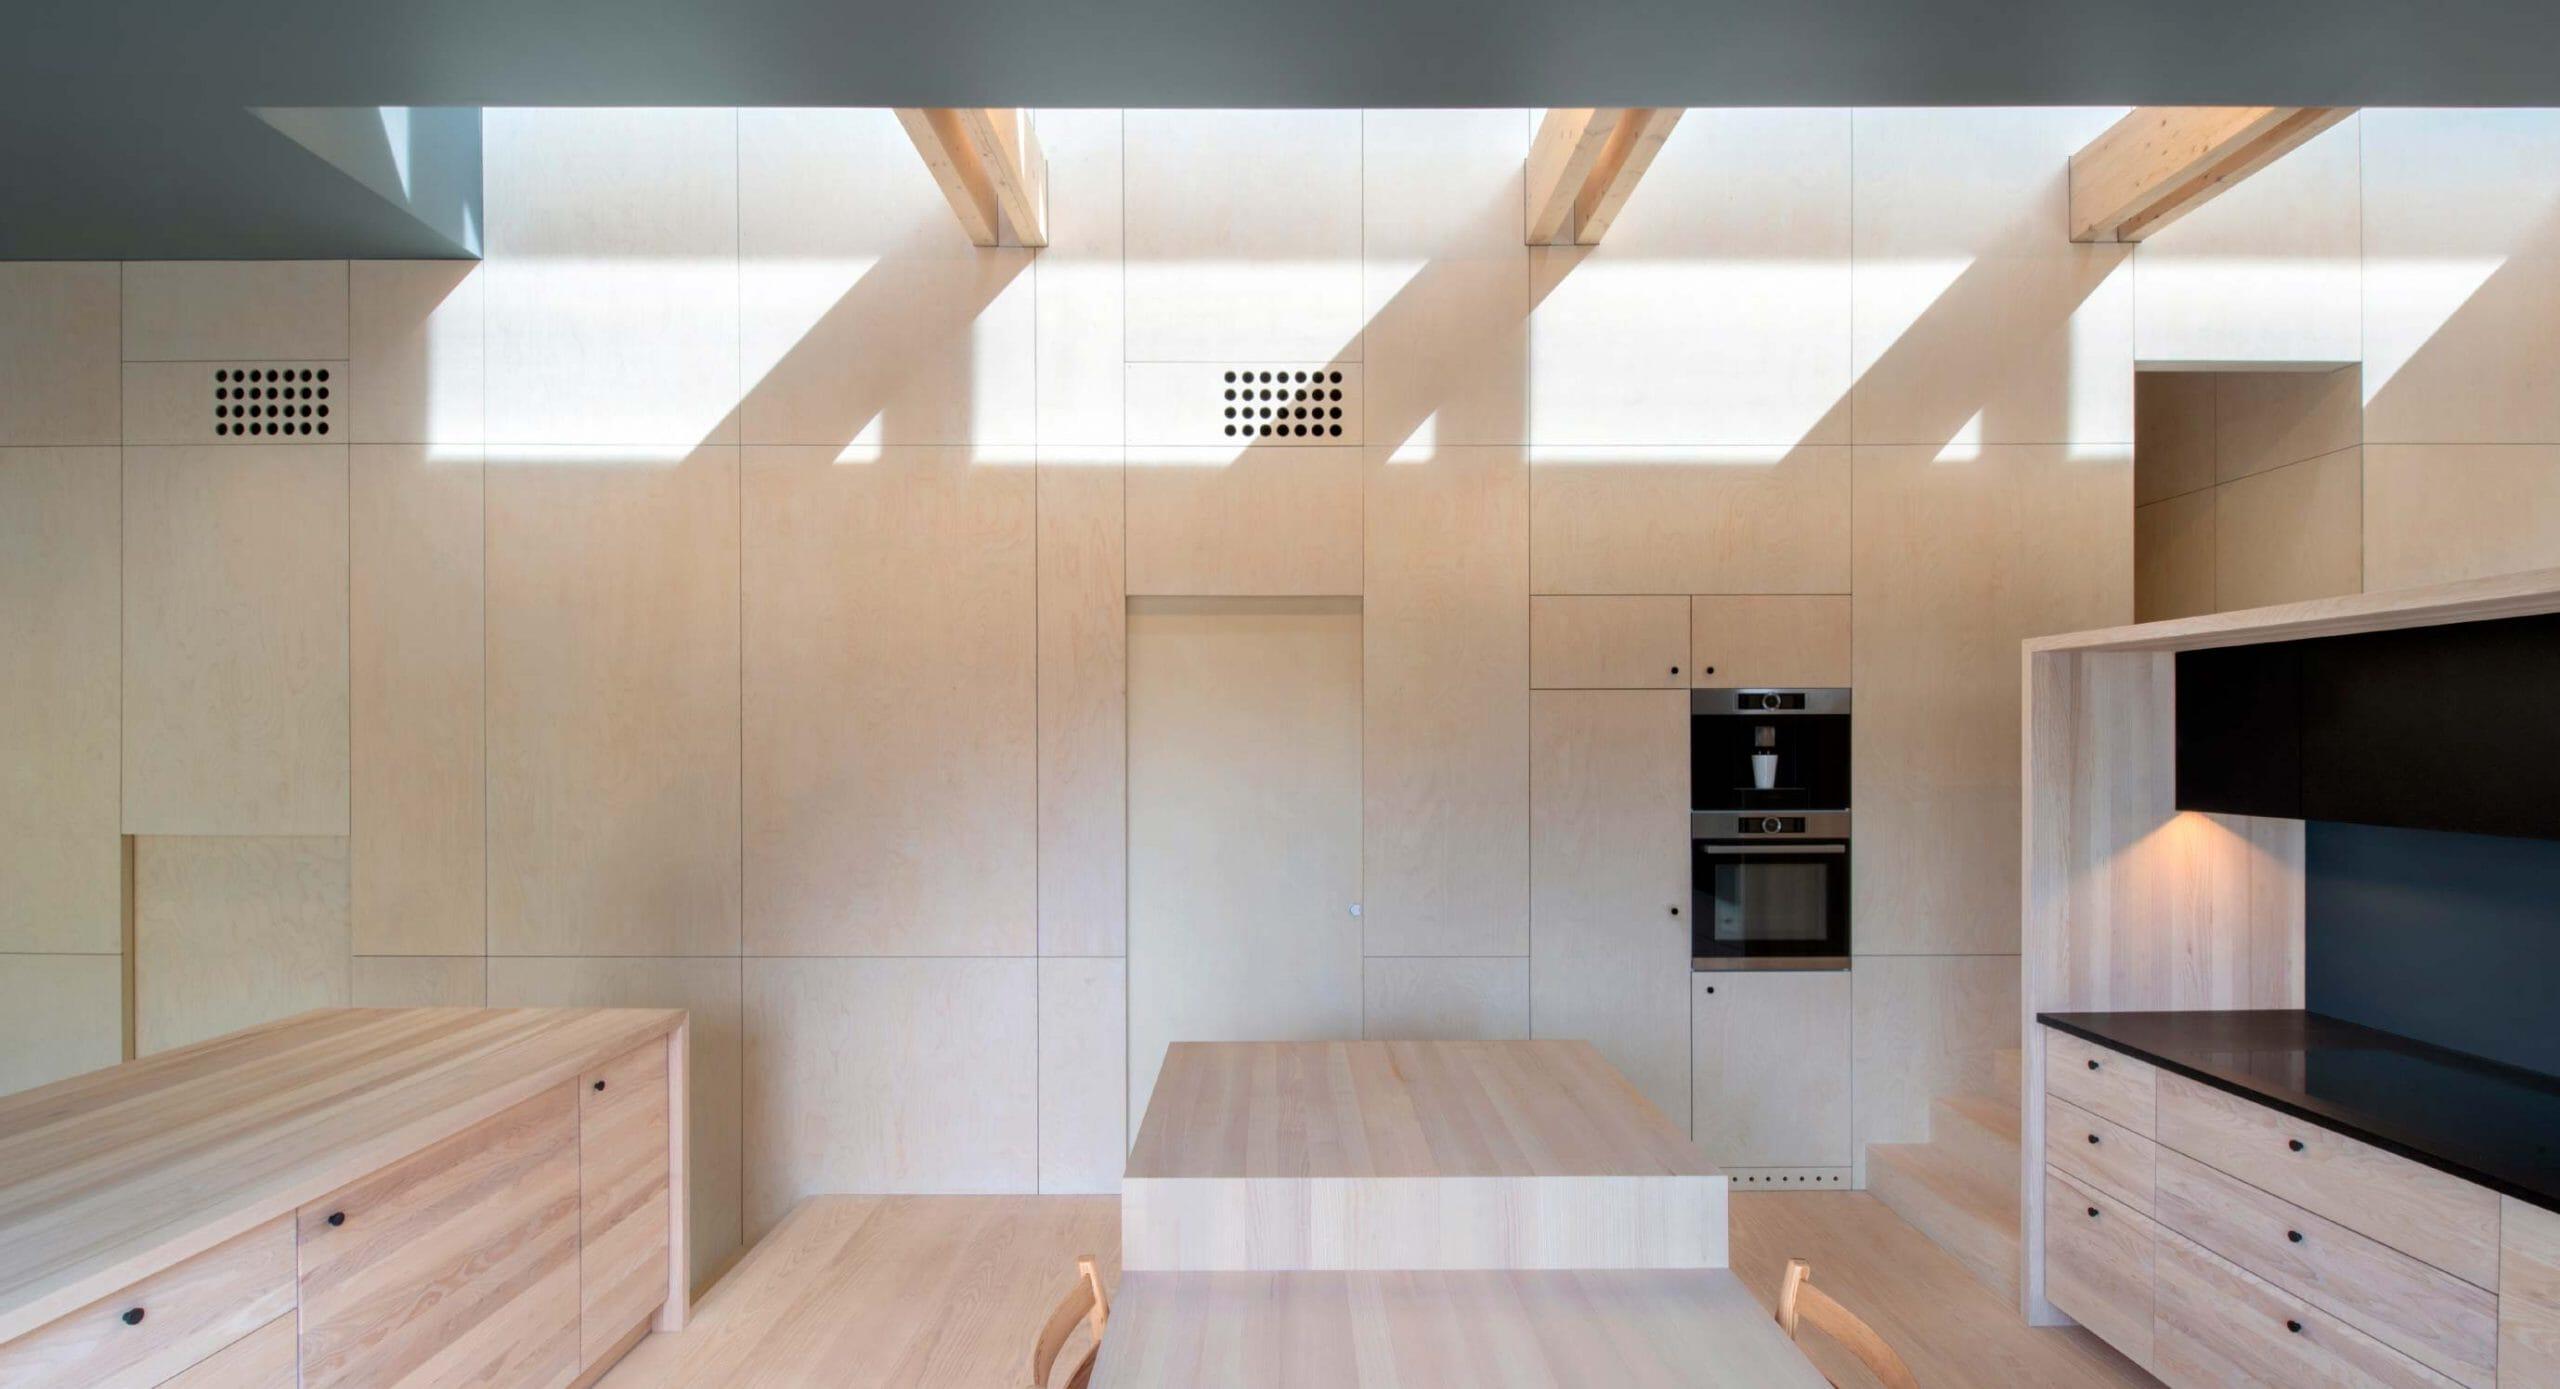 Villa Void: Directing natural light